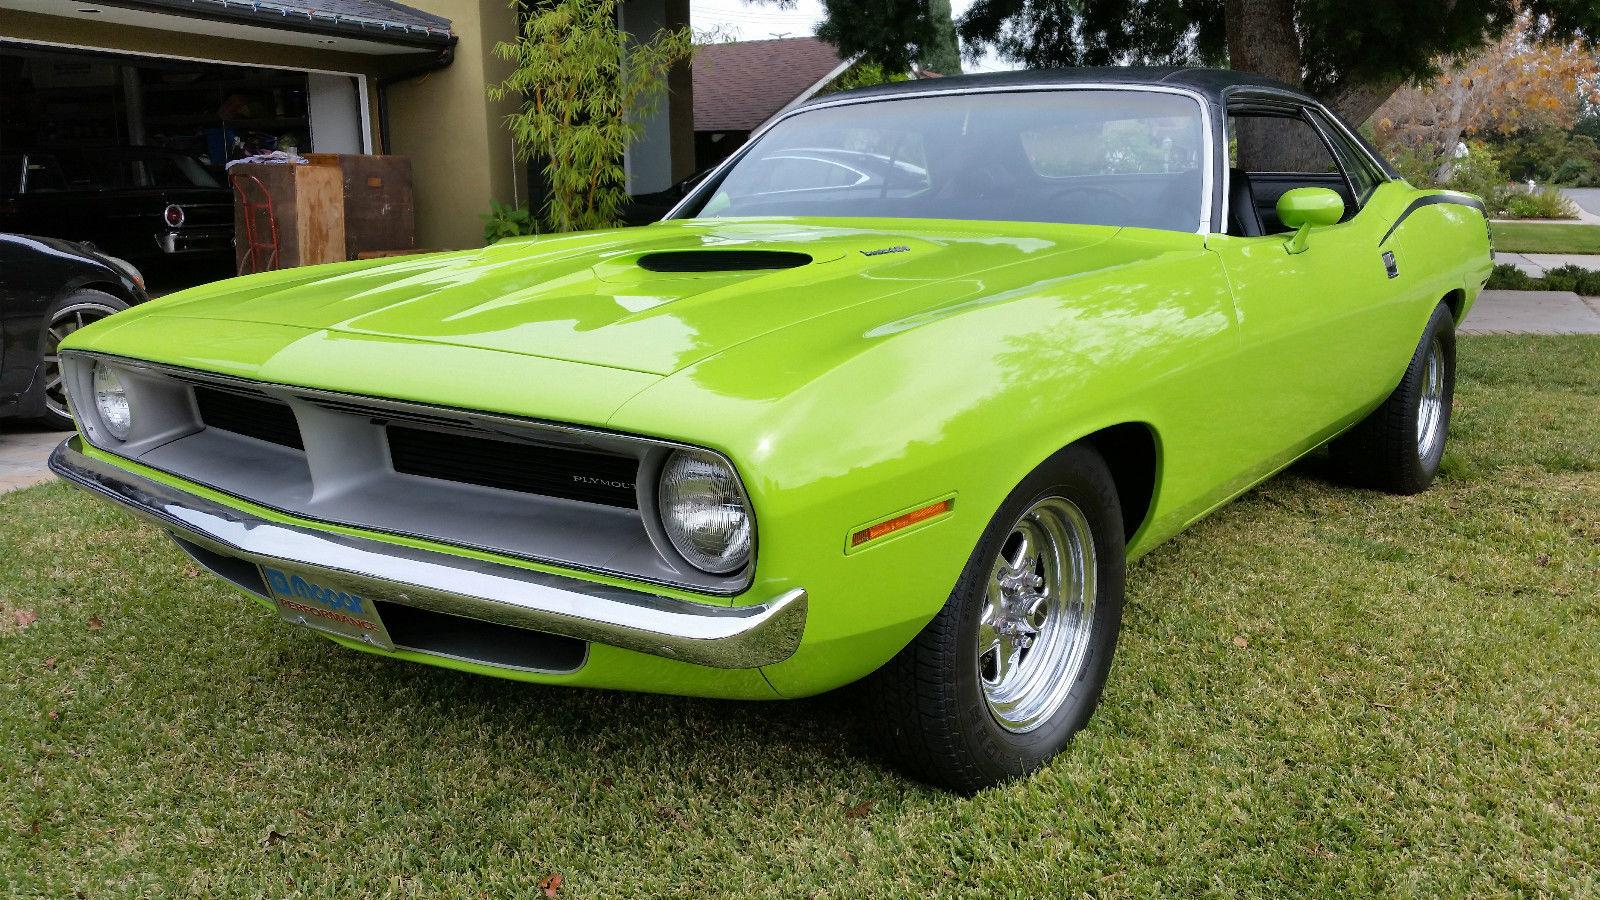 Cuda Green 1970 Dodge Barracuda Restored, 440 6 pack with MSD